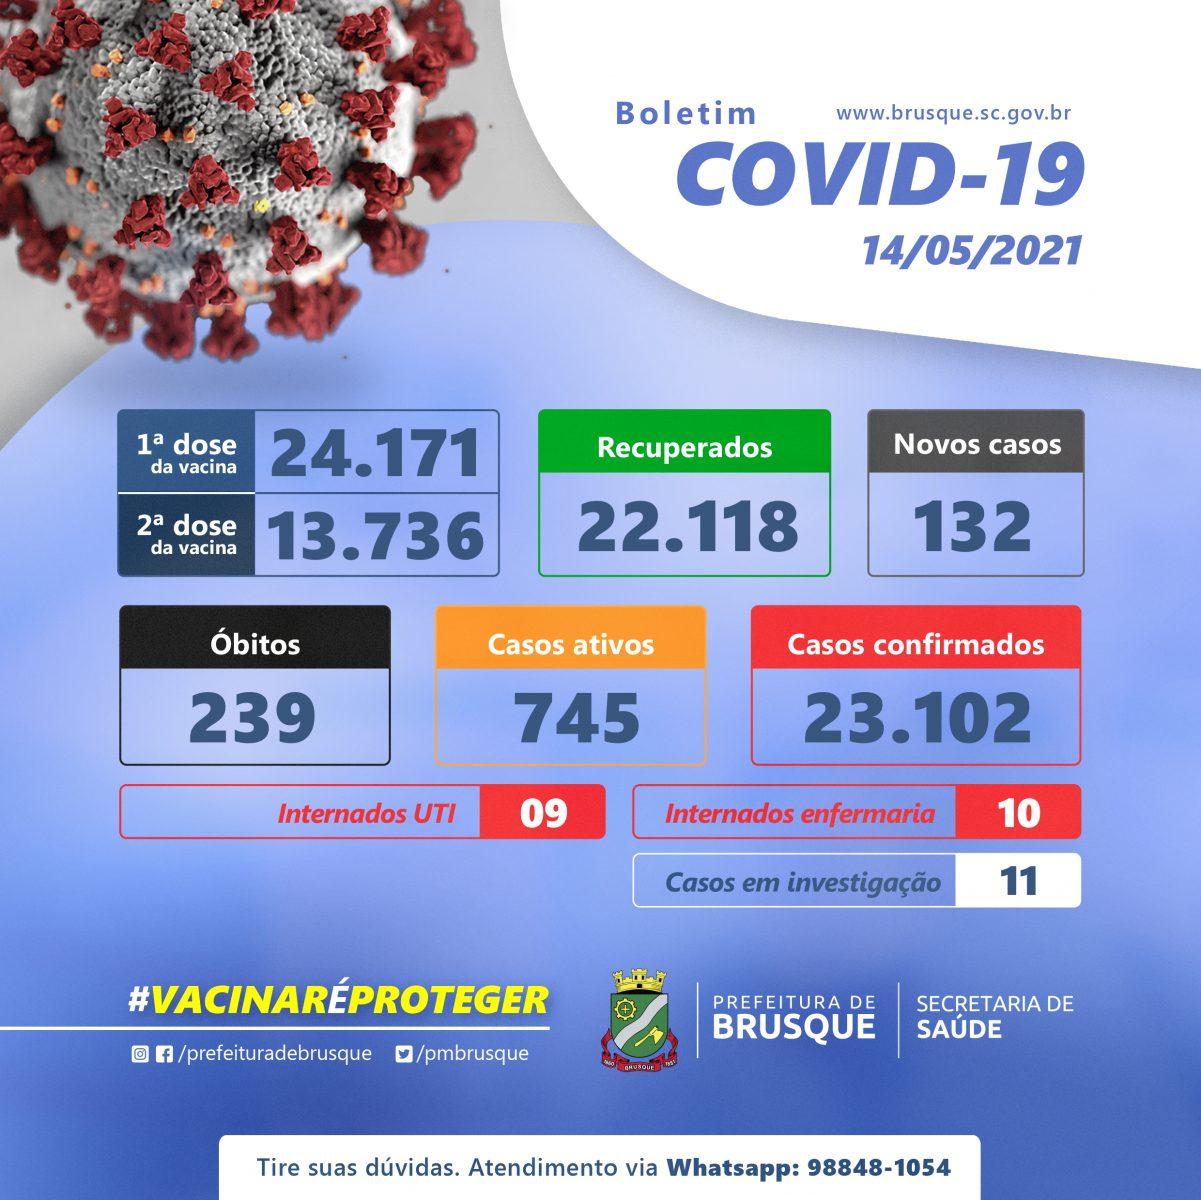 Covid 19: Confira o boletim epidemiológico desta sexta-feira (14)